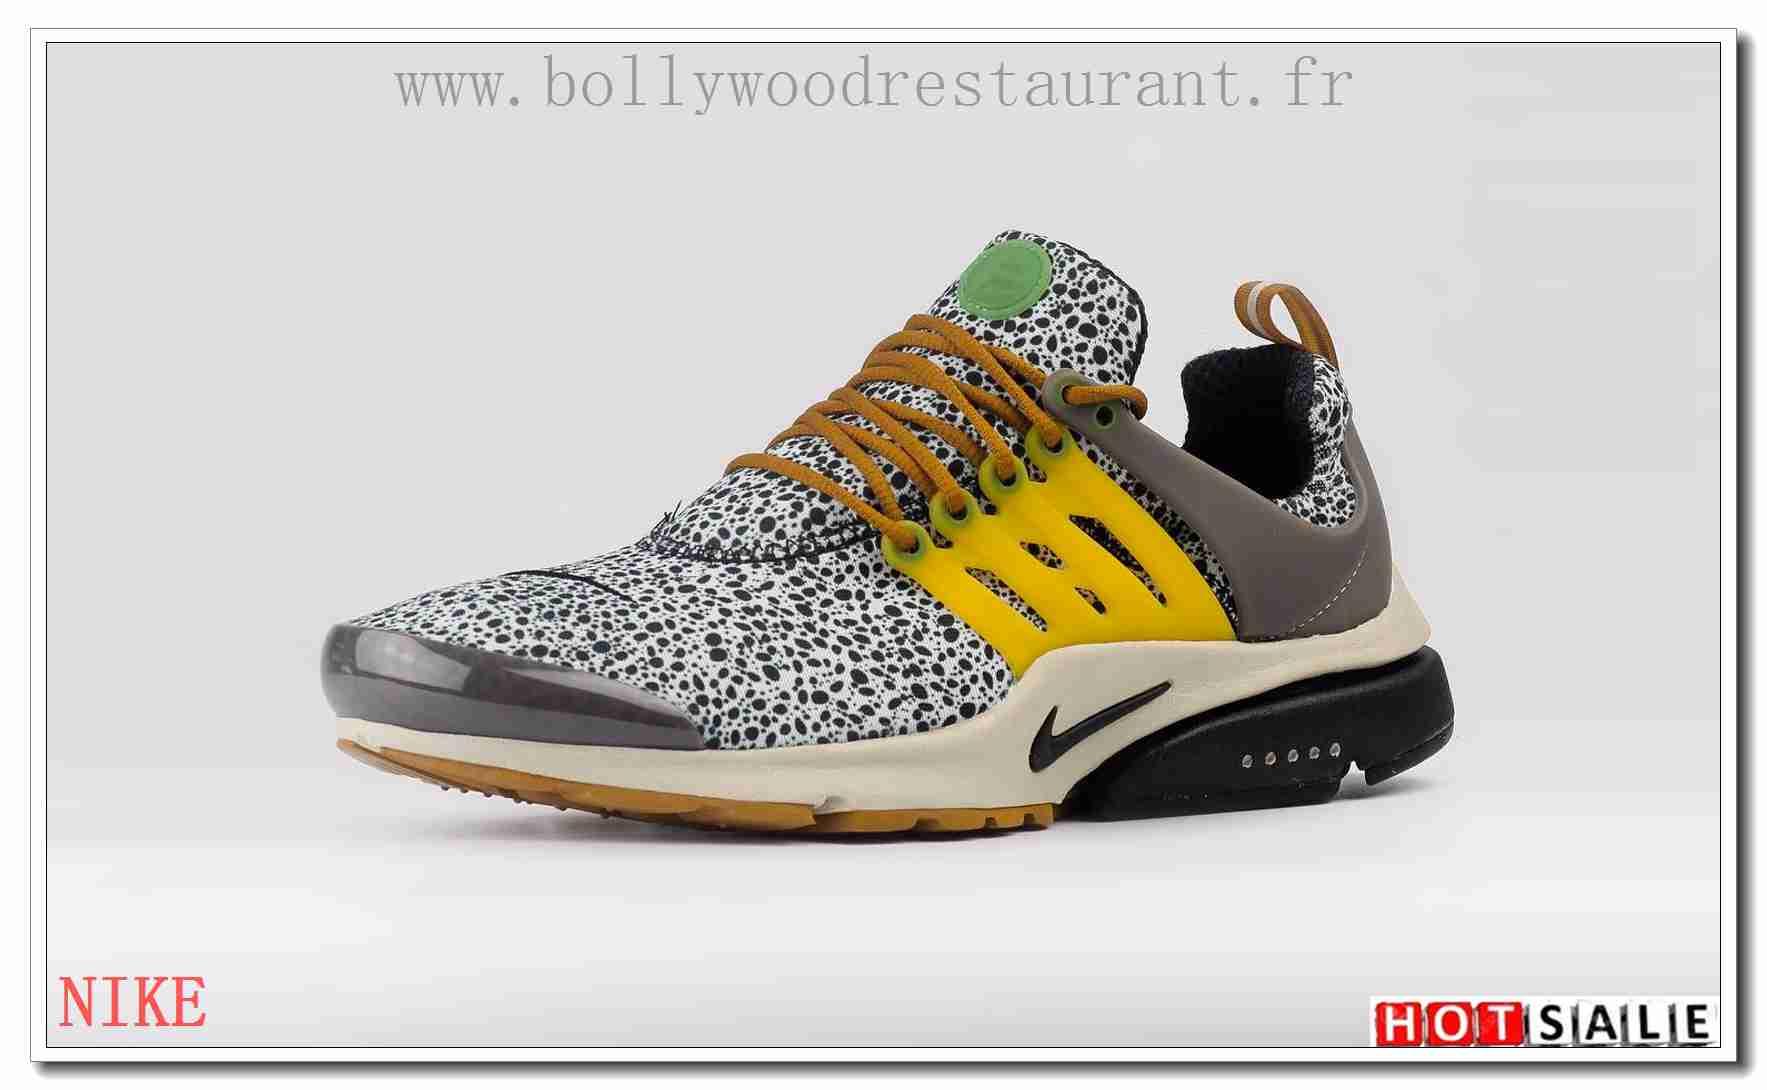 brand new b342f a7e5f TY9910 Qualité 100% Garanti 2018 Nouveau style Nike Air Presto - Femme  Chaussures - Soldes Pas Cher - H.K.Y. 915 - Taille   36~39